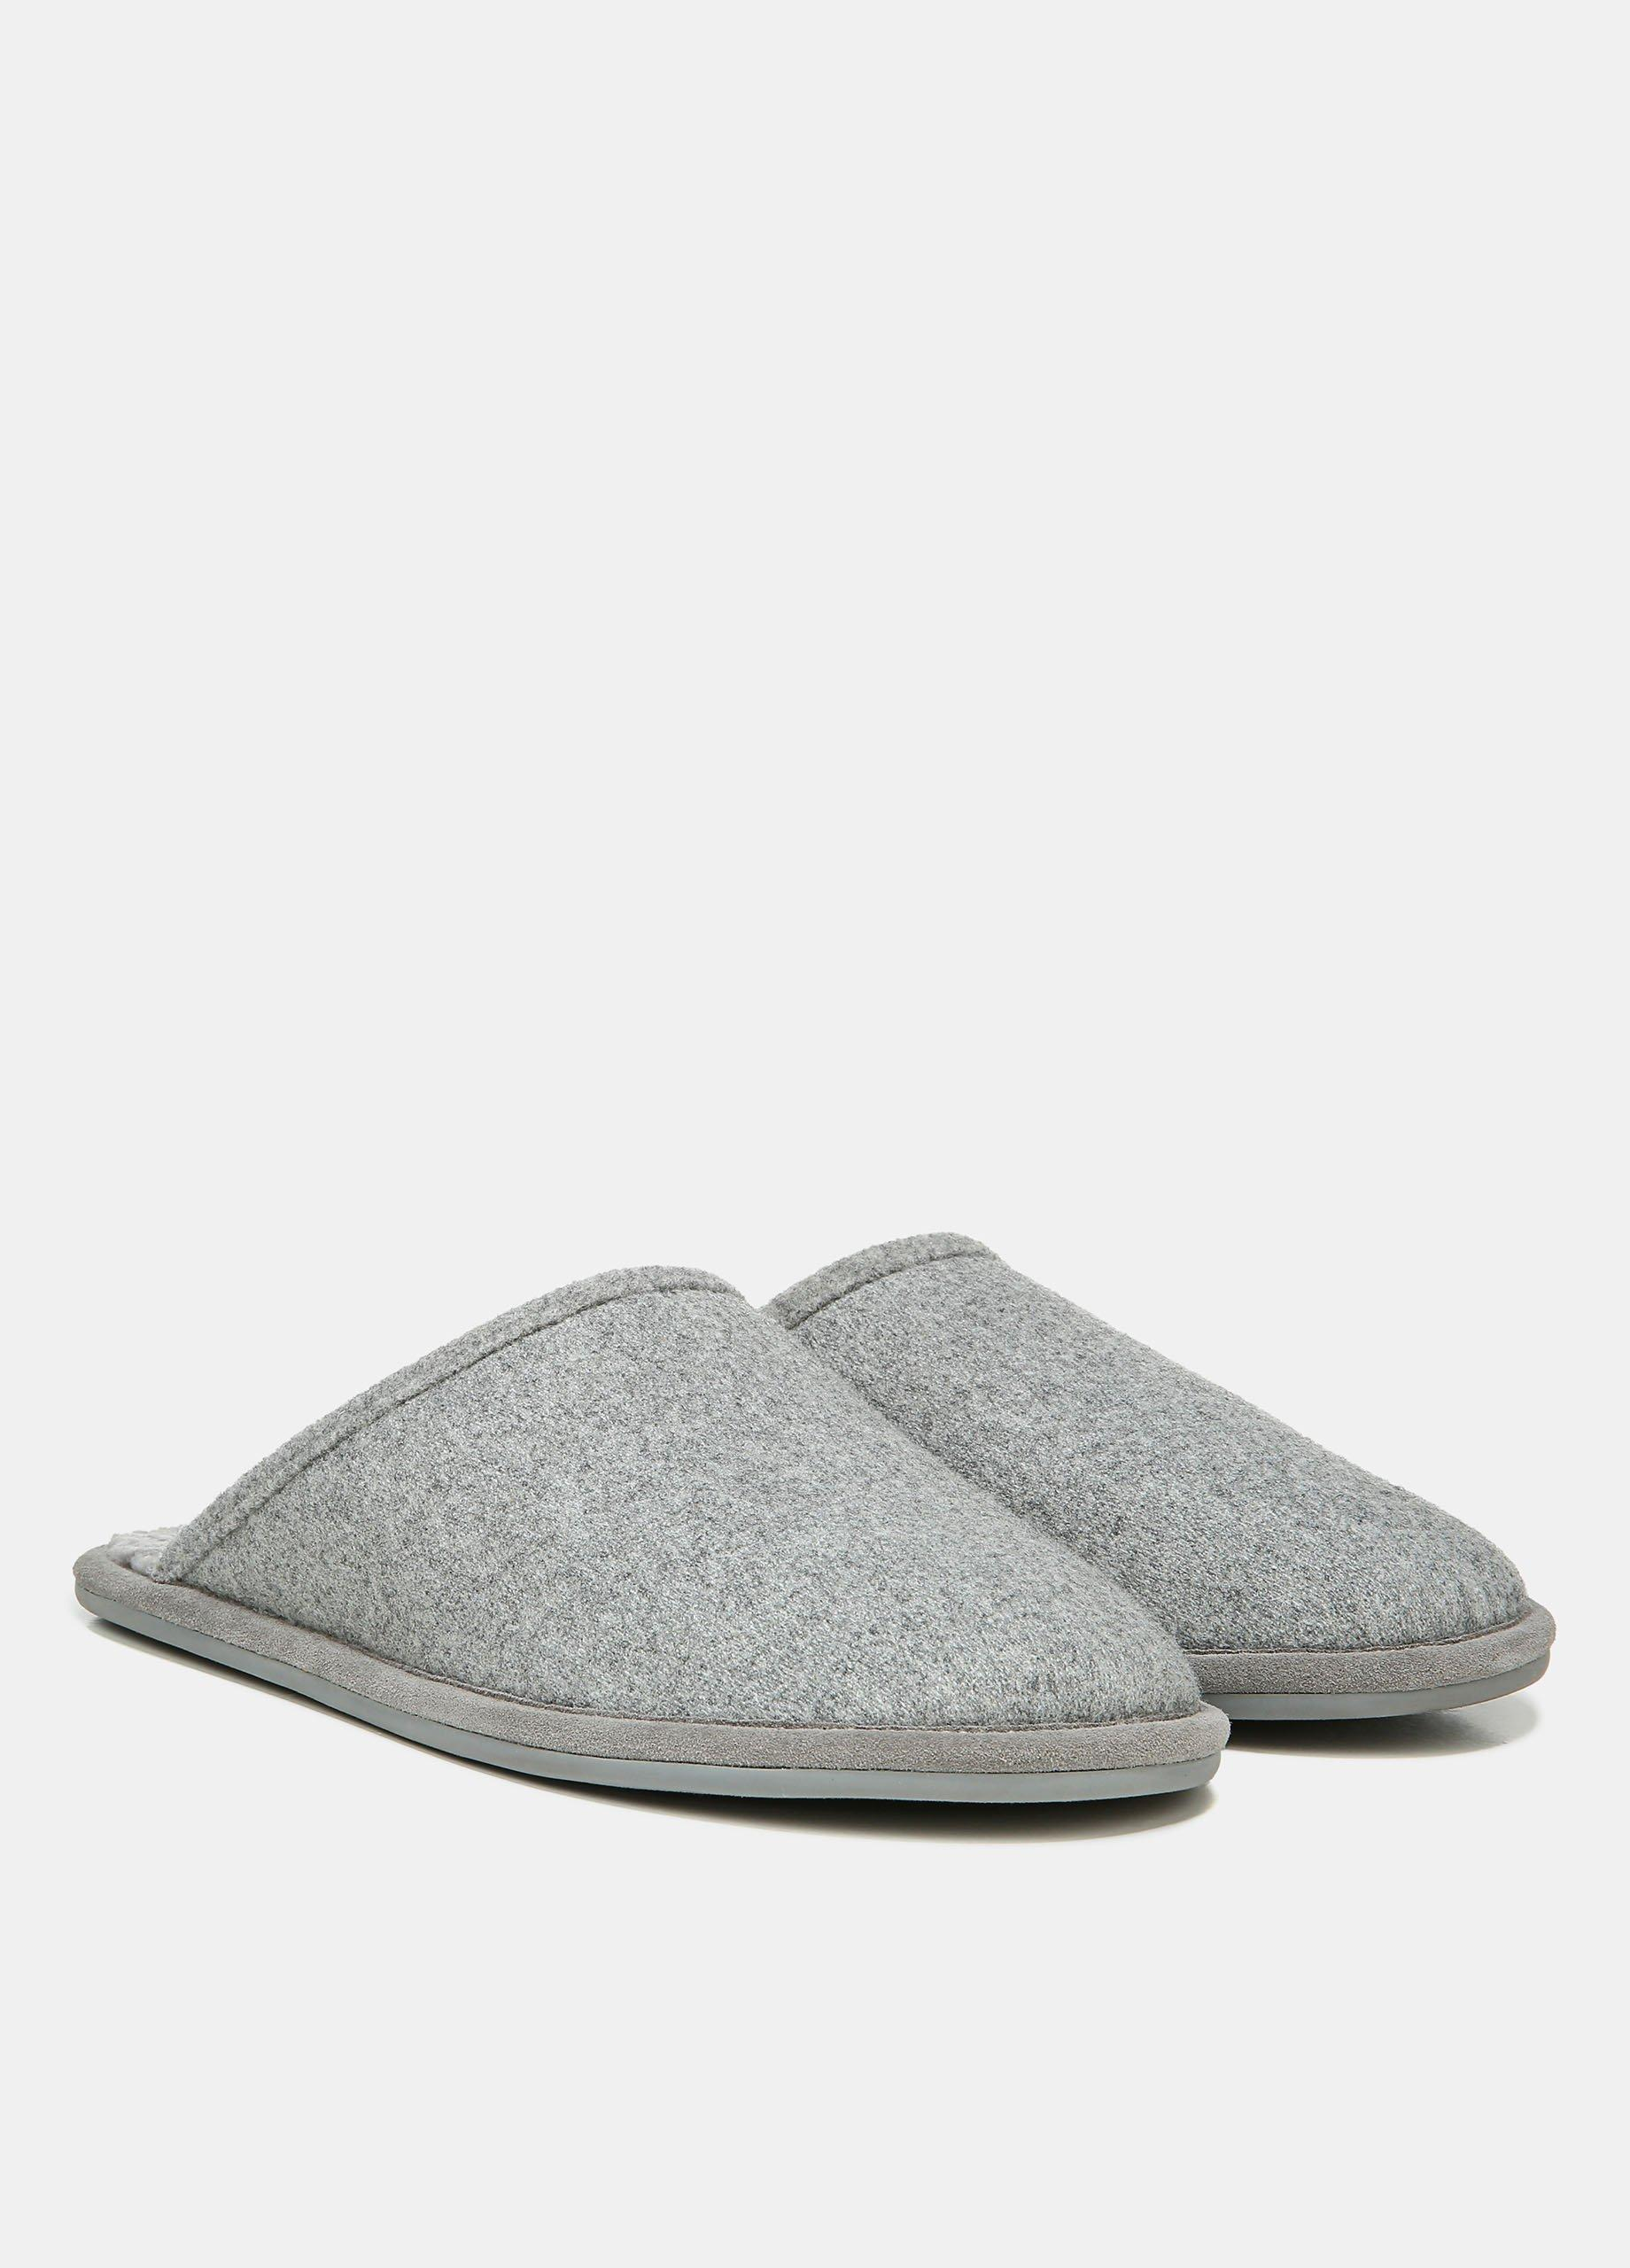 Wool Hampton Slipper